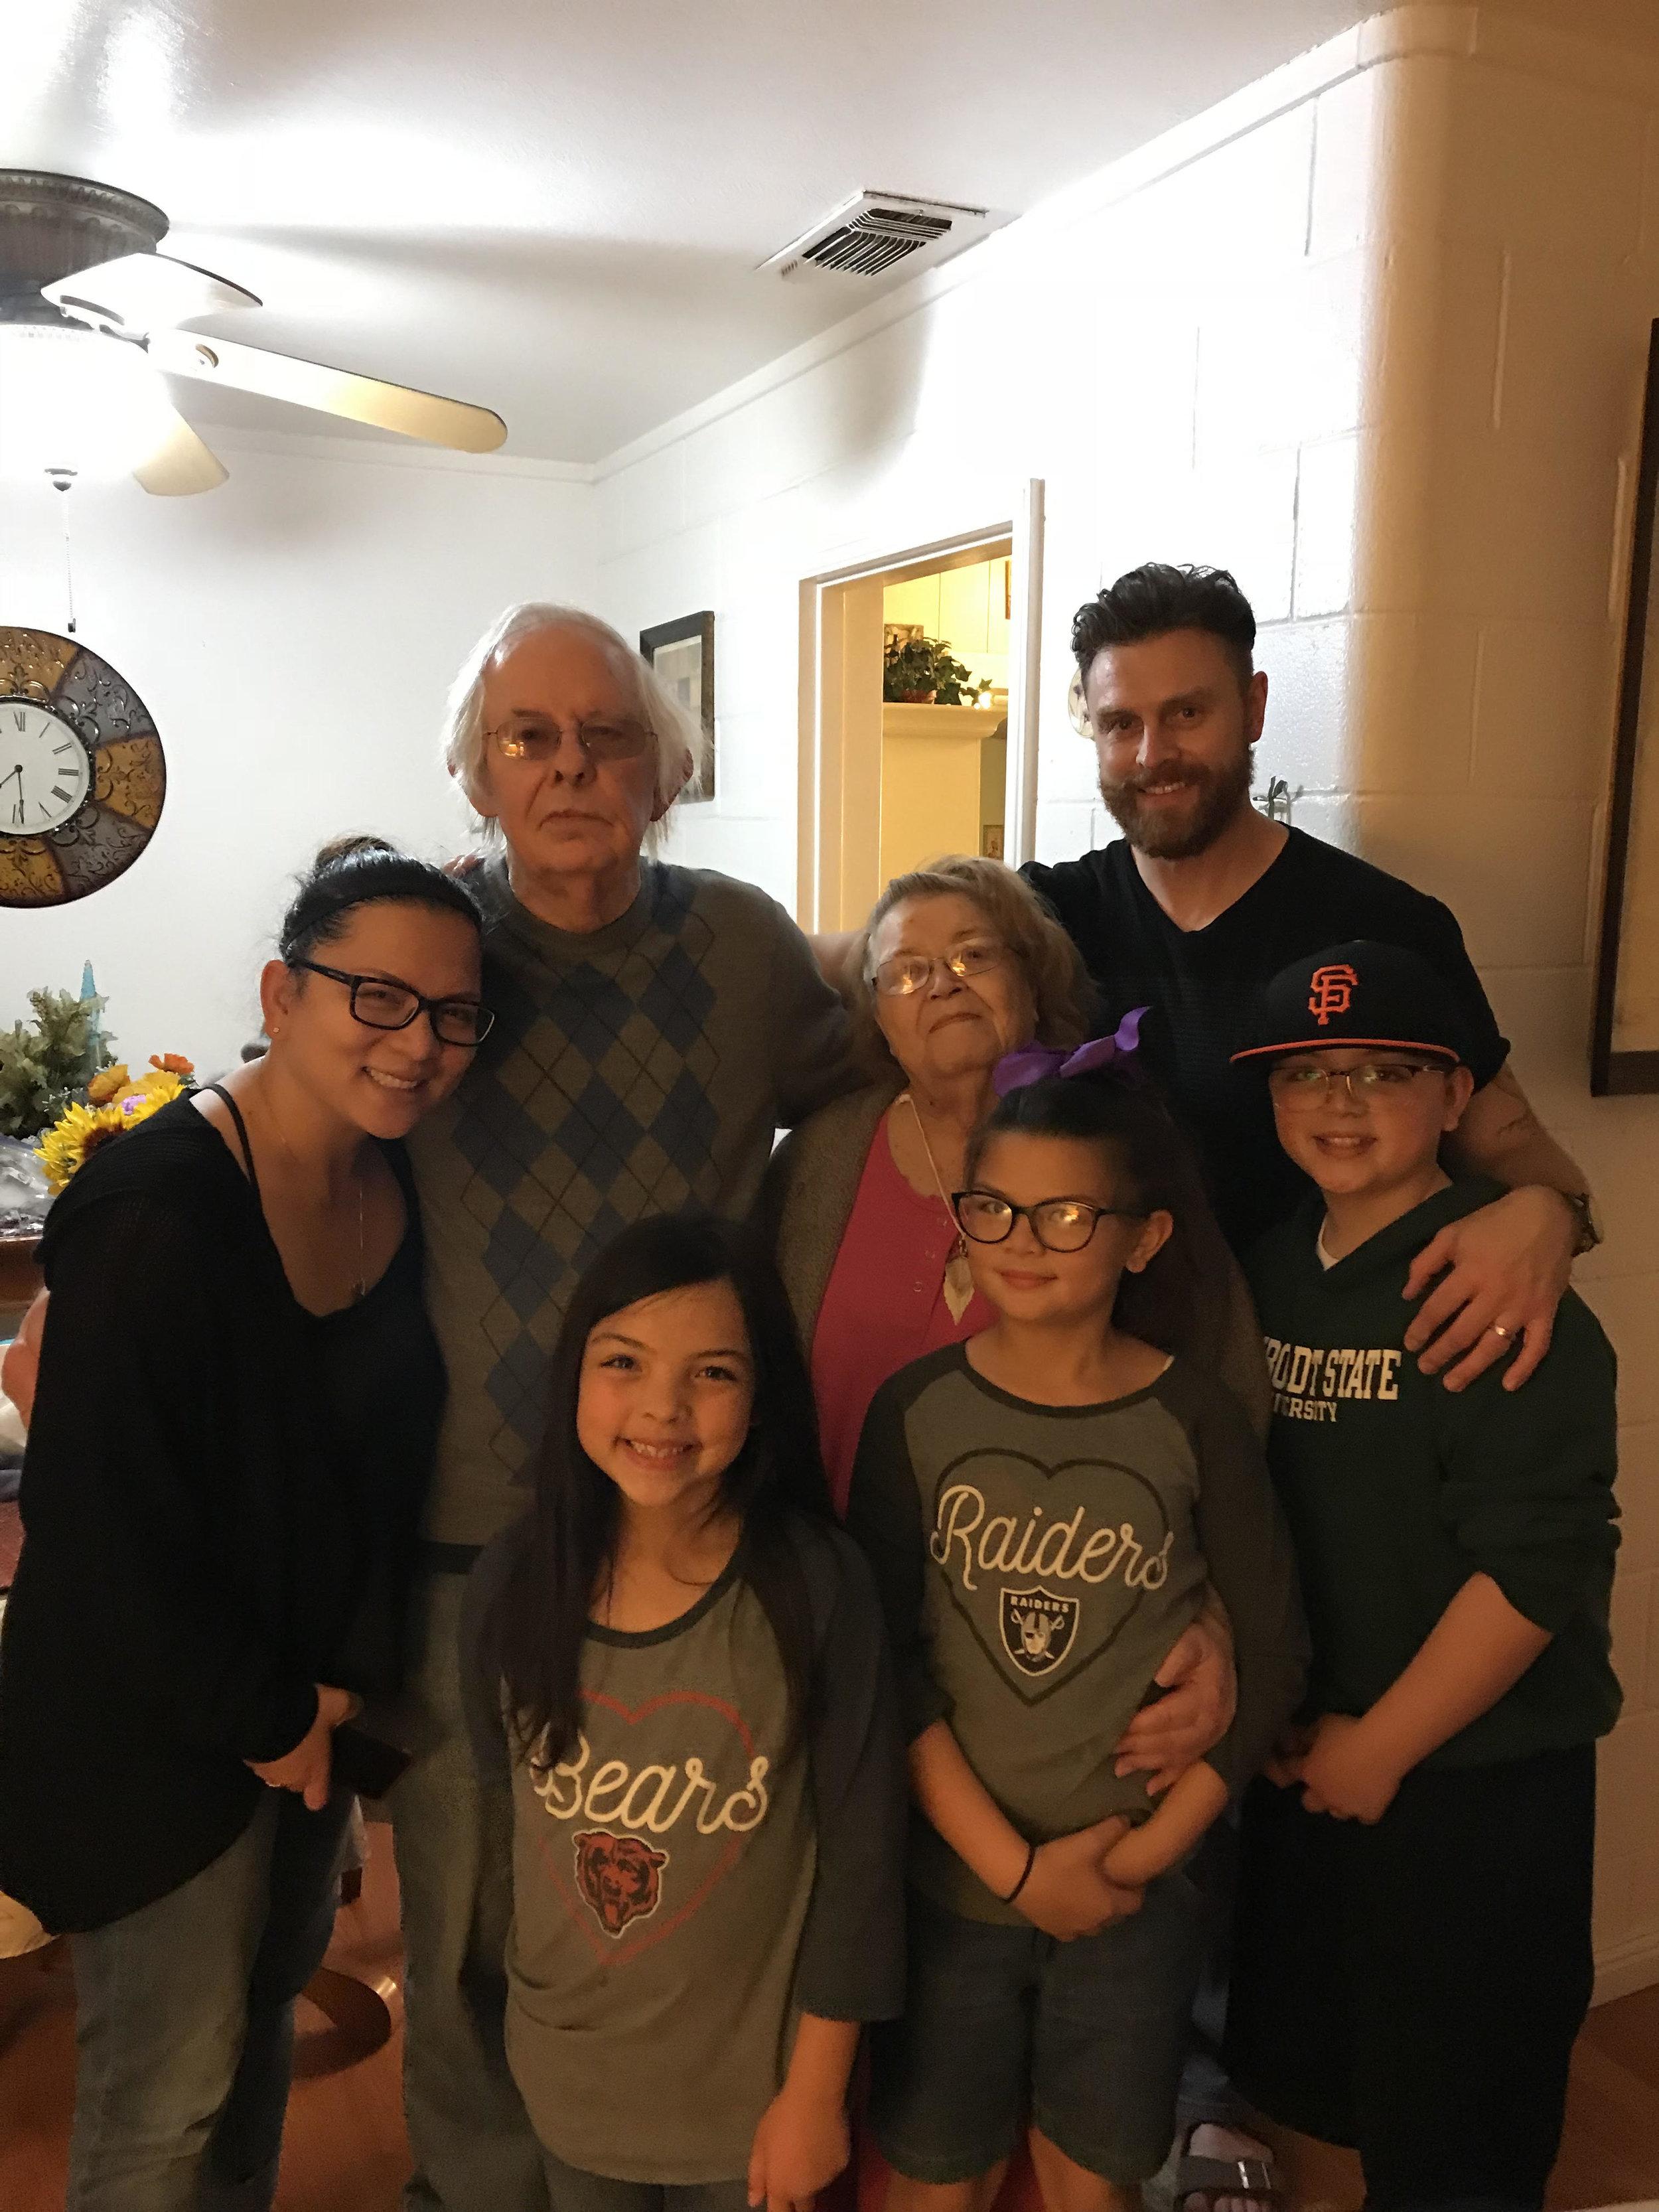 My wife, my grandfather, my grandmother, myself and my three children.